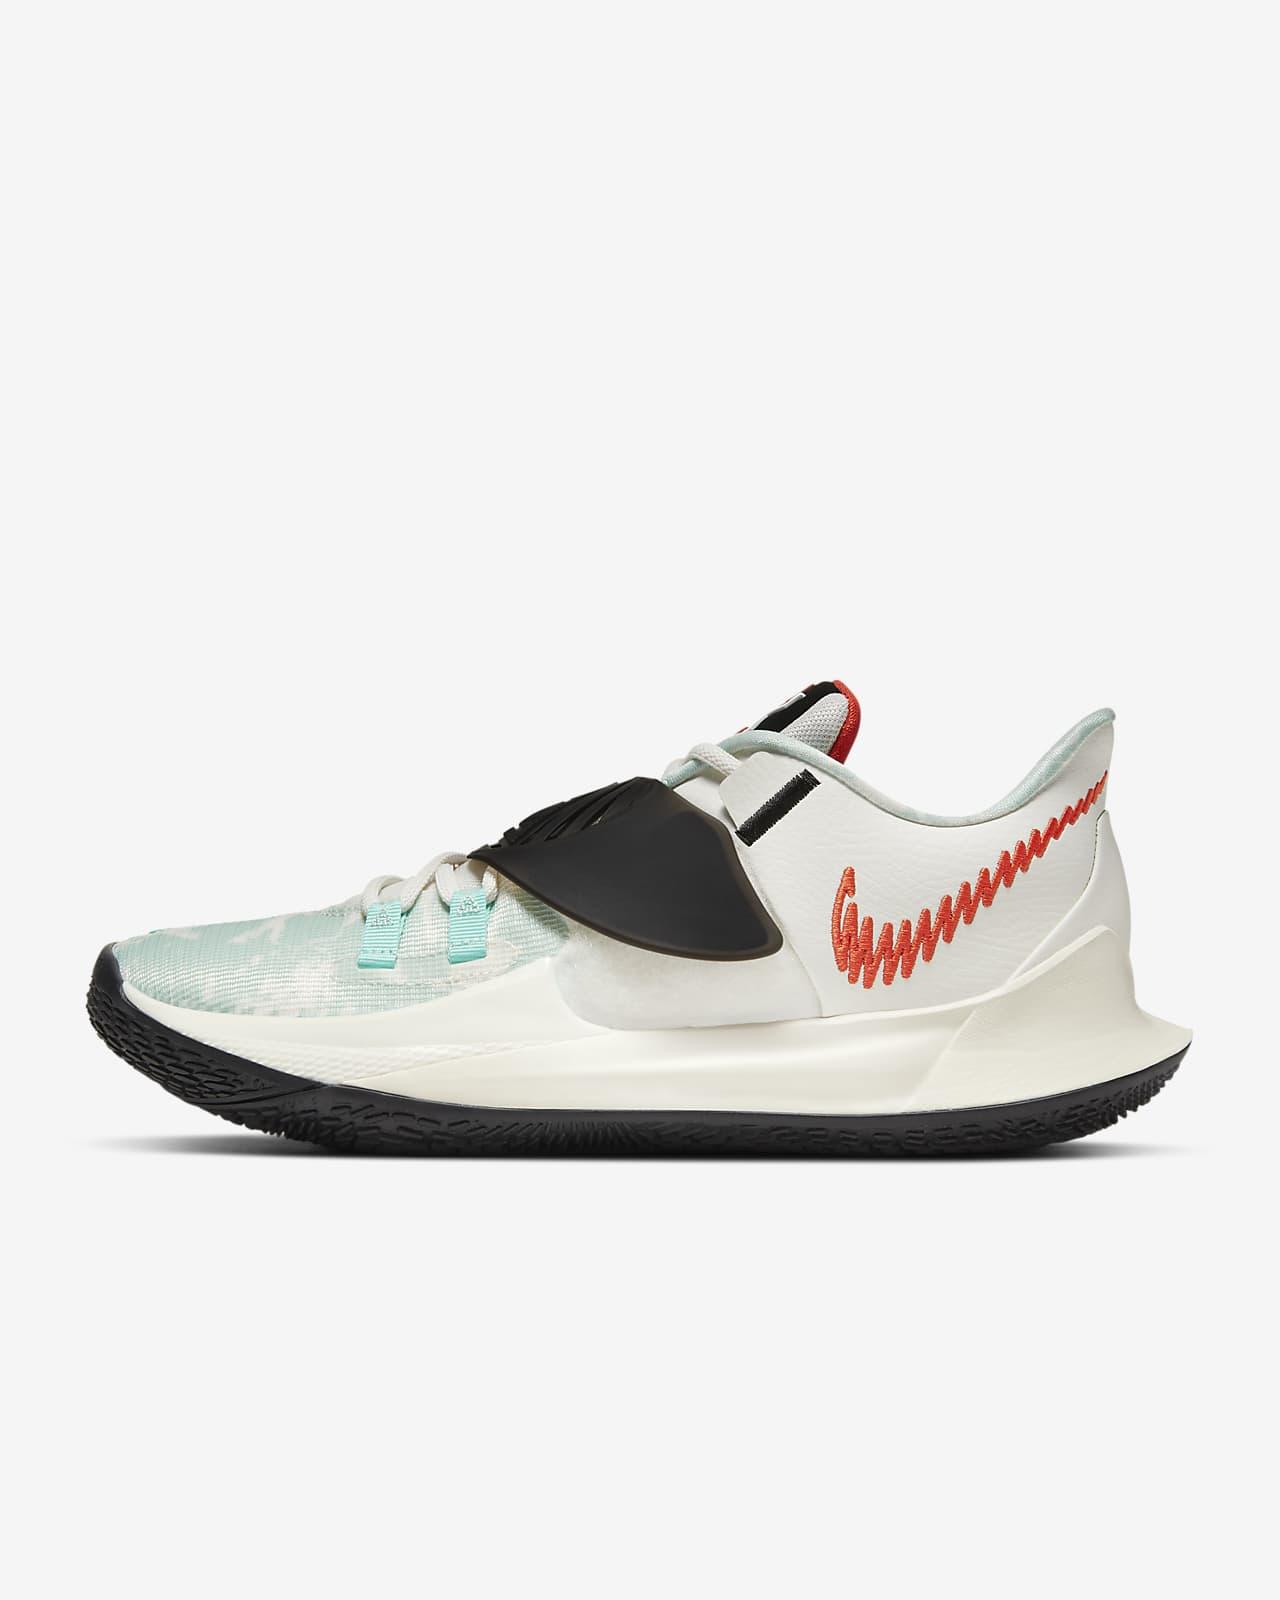 Chaussure de basketball Kyrie Low 3